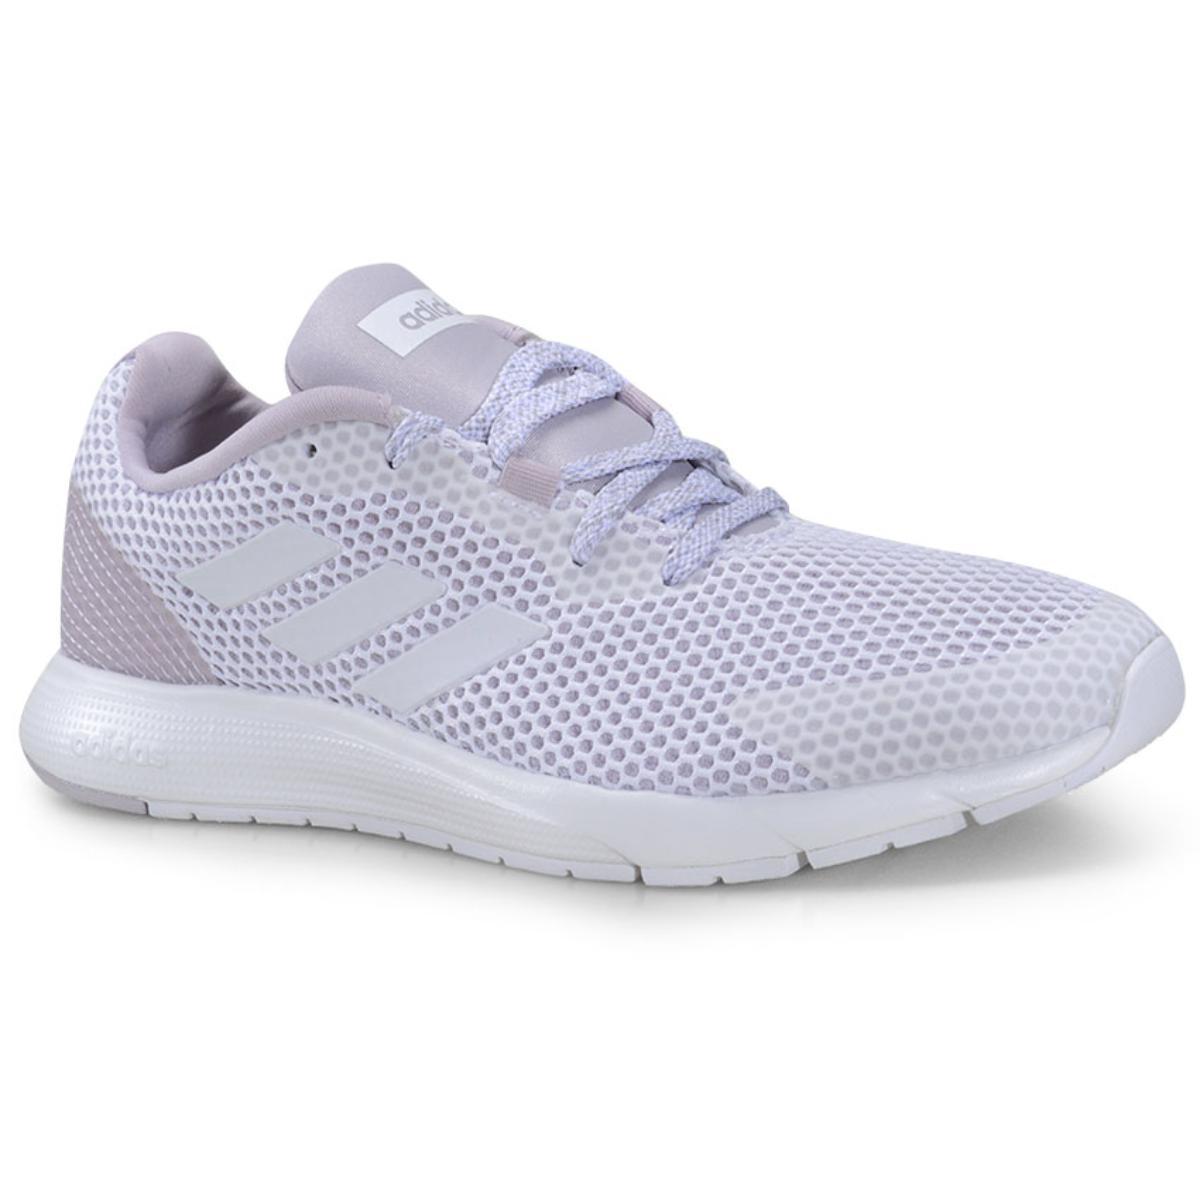 Tênis Feminino Adidas Ee9932 Sooraj w Branco/lilas